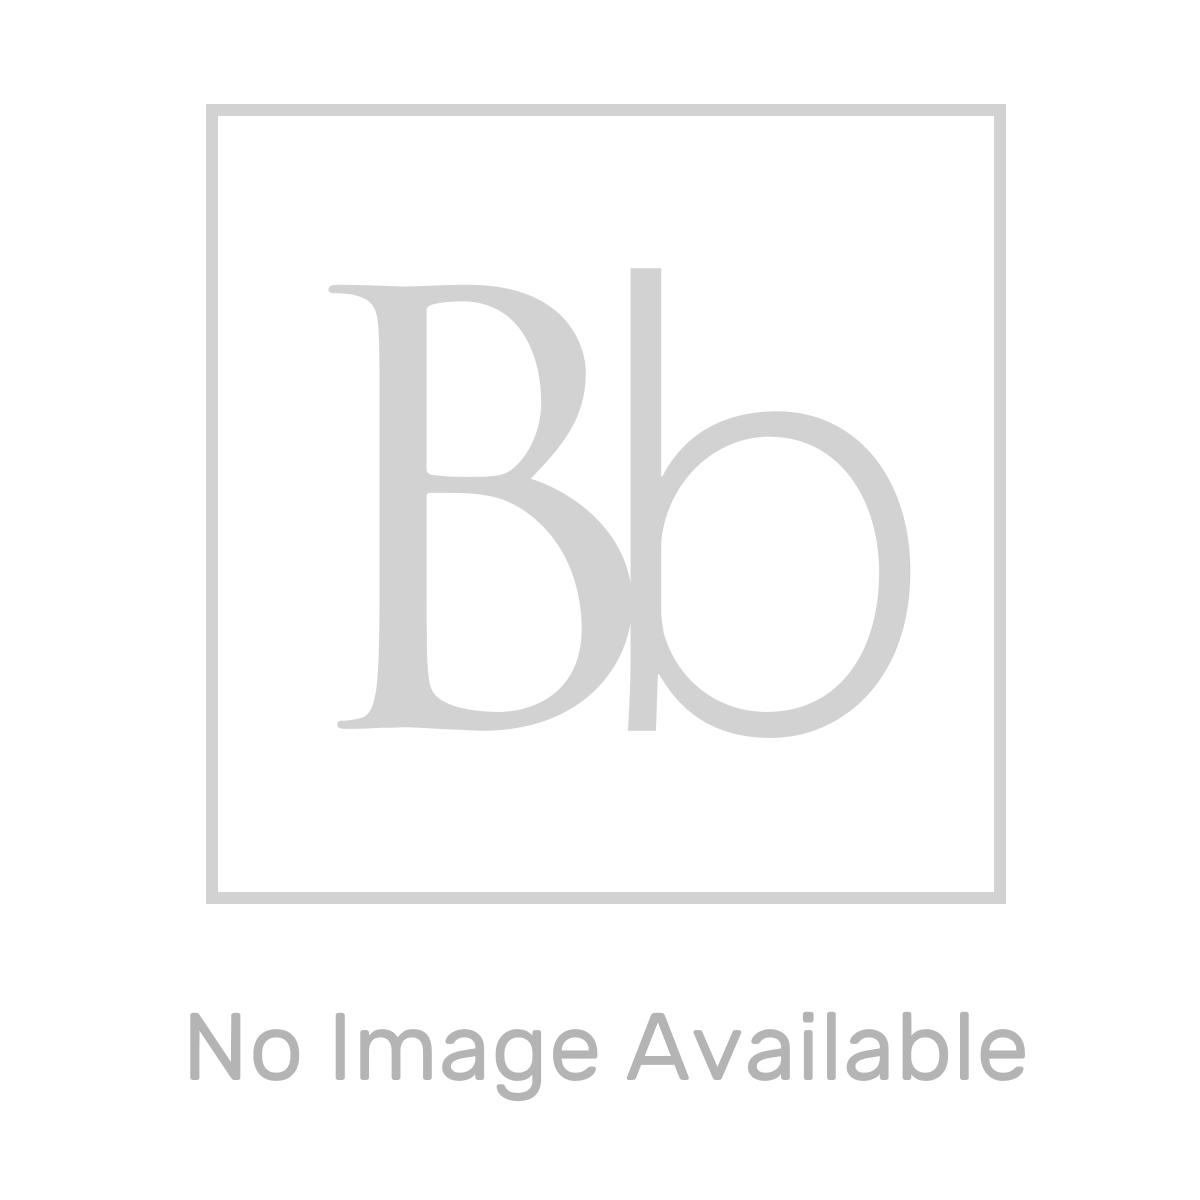 RAK Surface Ash Matt Tile 600 x 1200mm Lifestyle